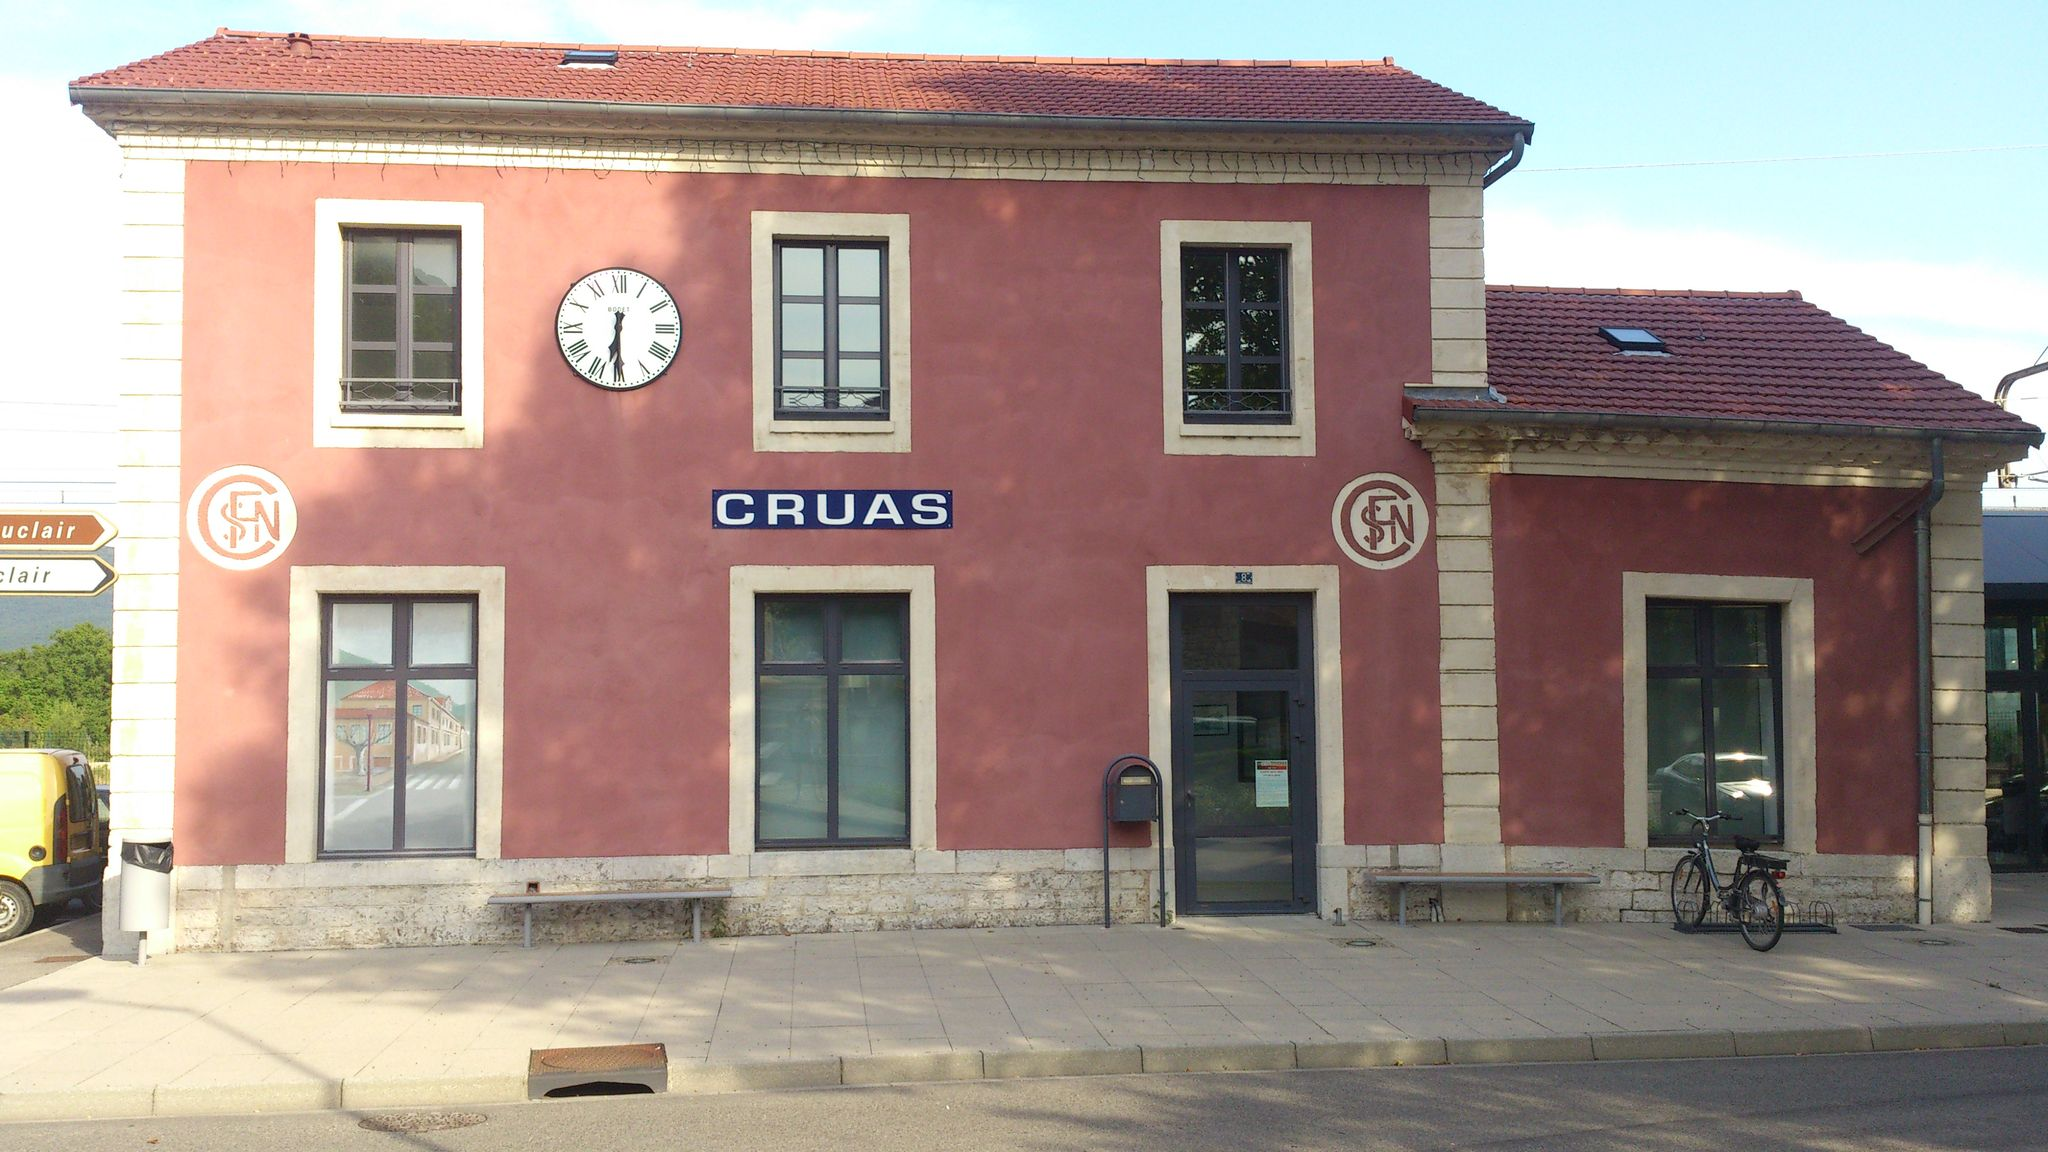 Cruas (Ardèche)